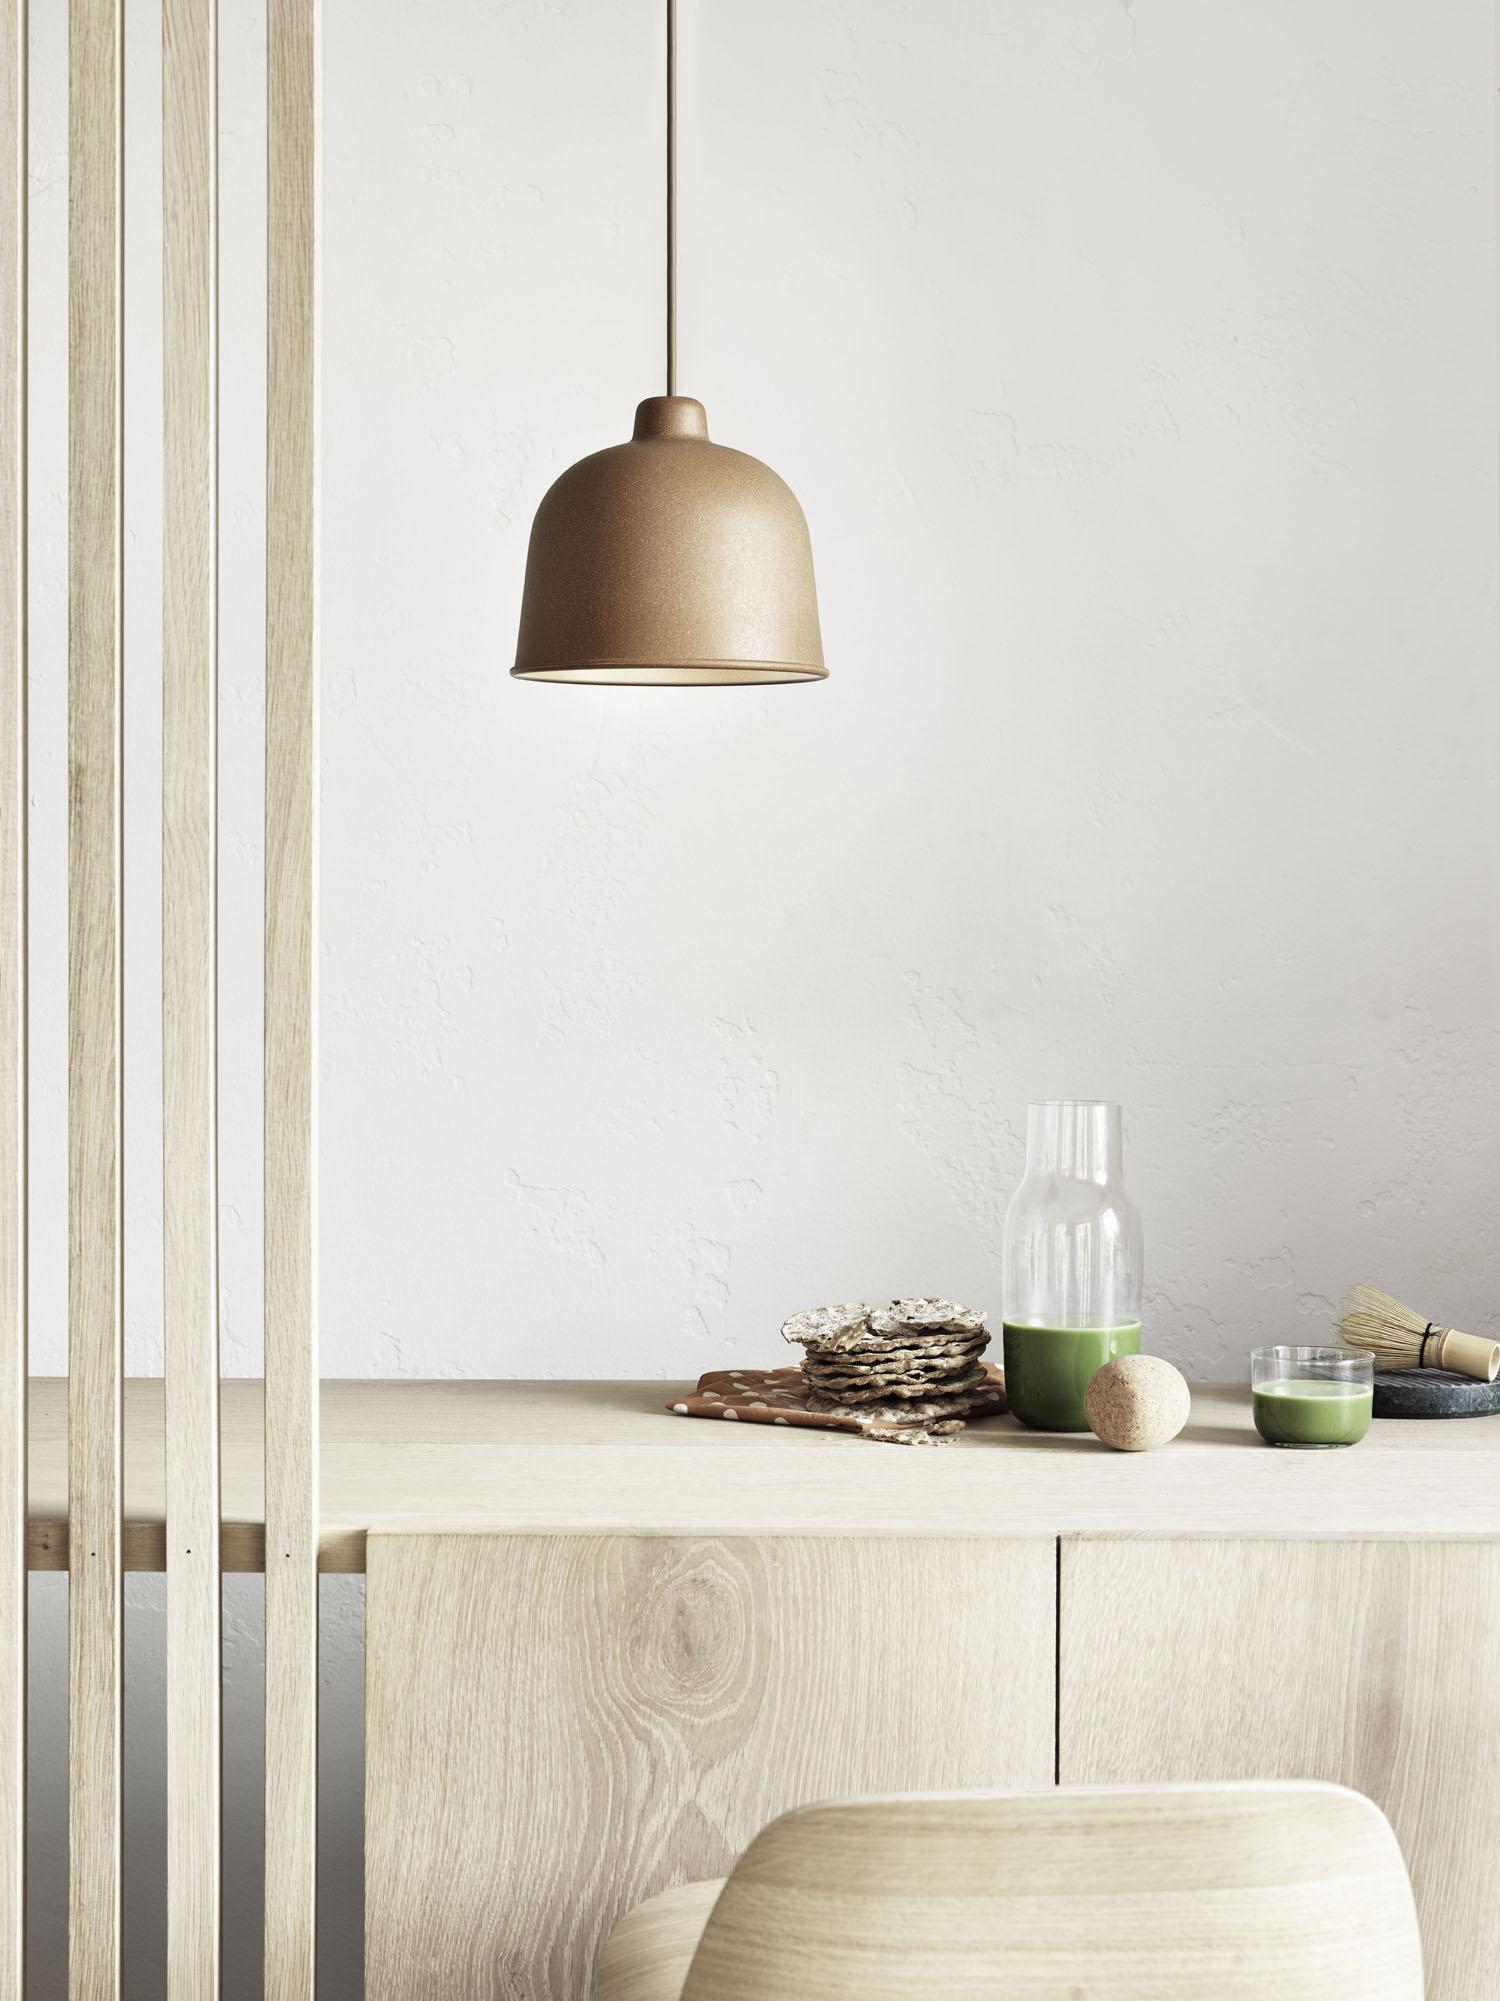 Muuto grain pendant light | Design Hunter